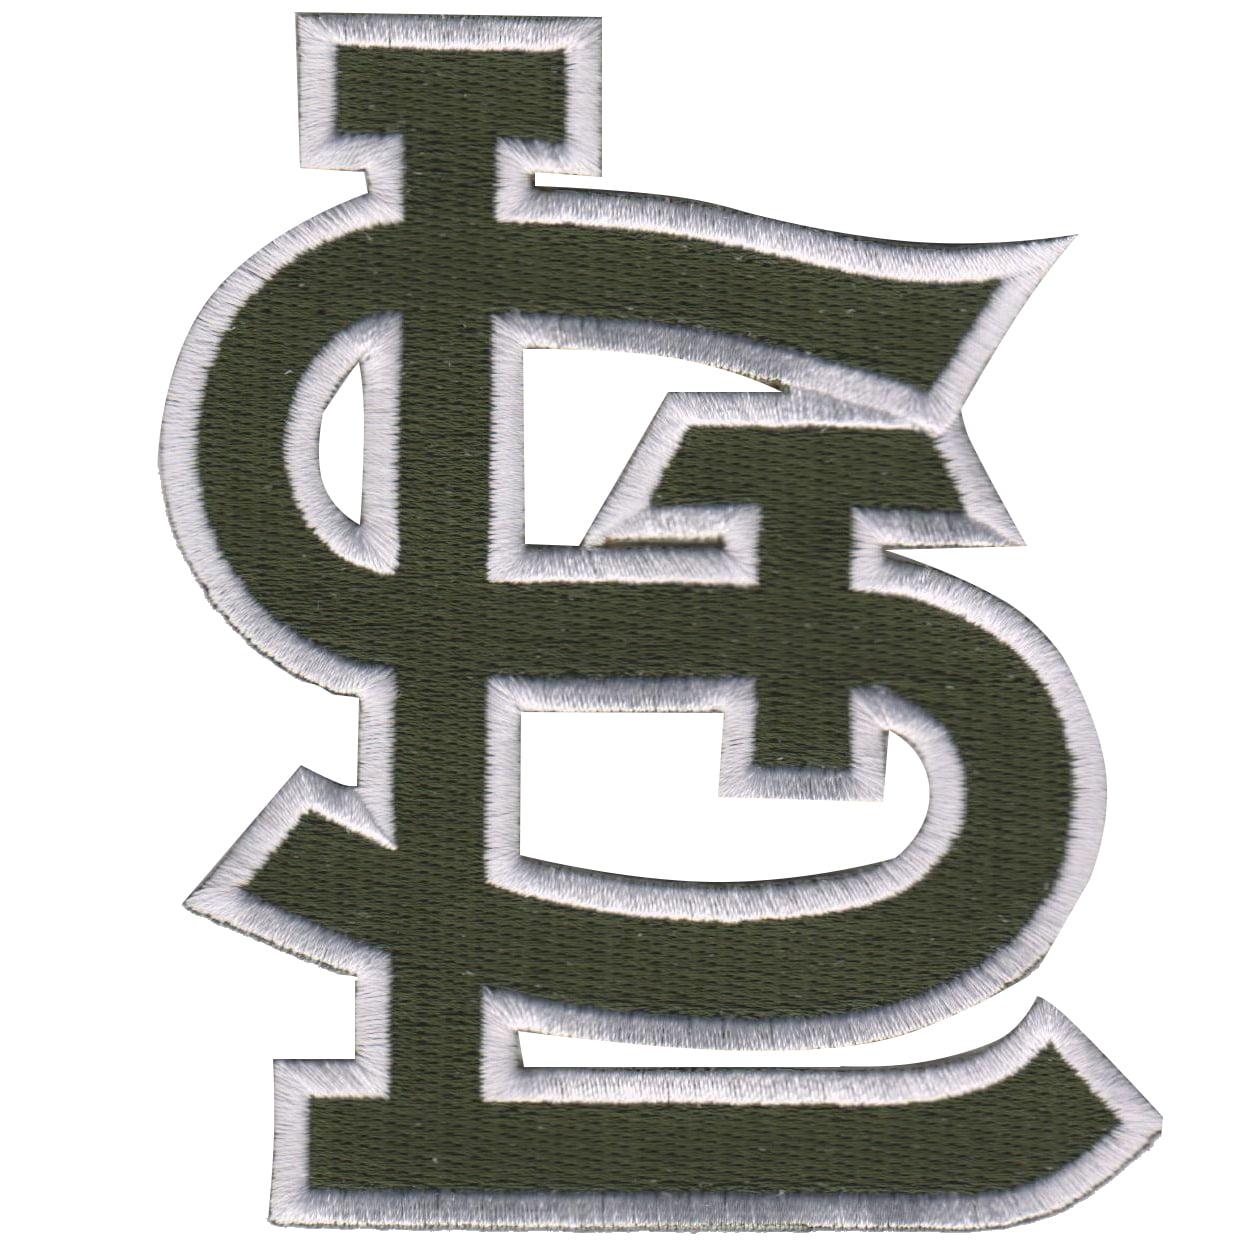 St. Louis Cardinals 2018 Memorial Day USMC Logo Patch - No Size